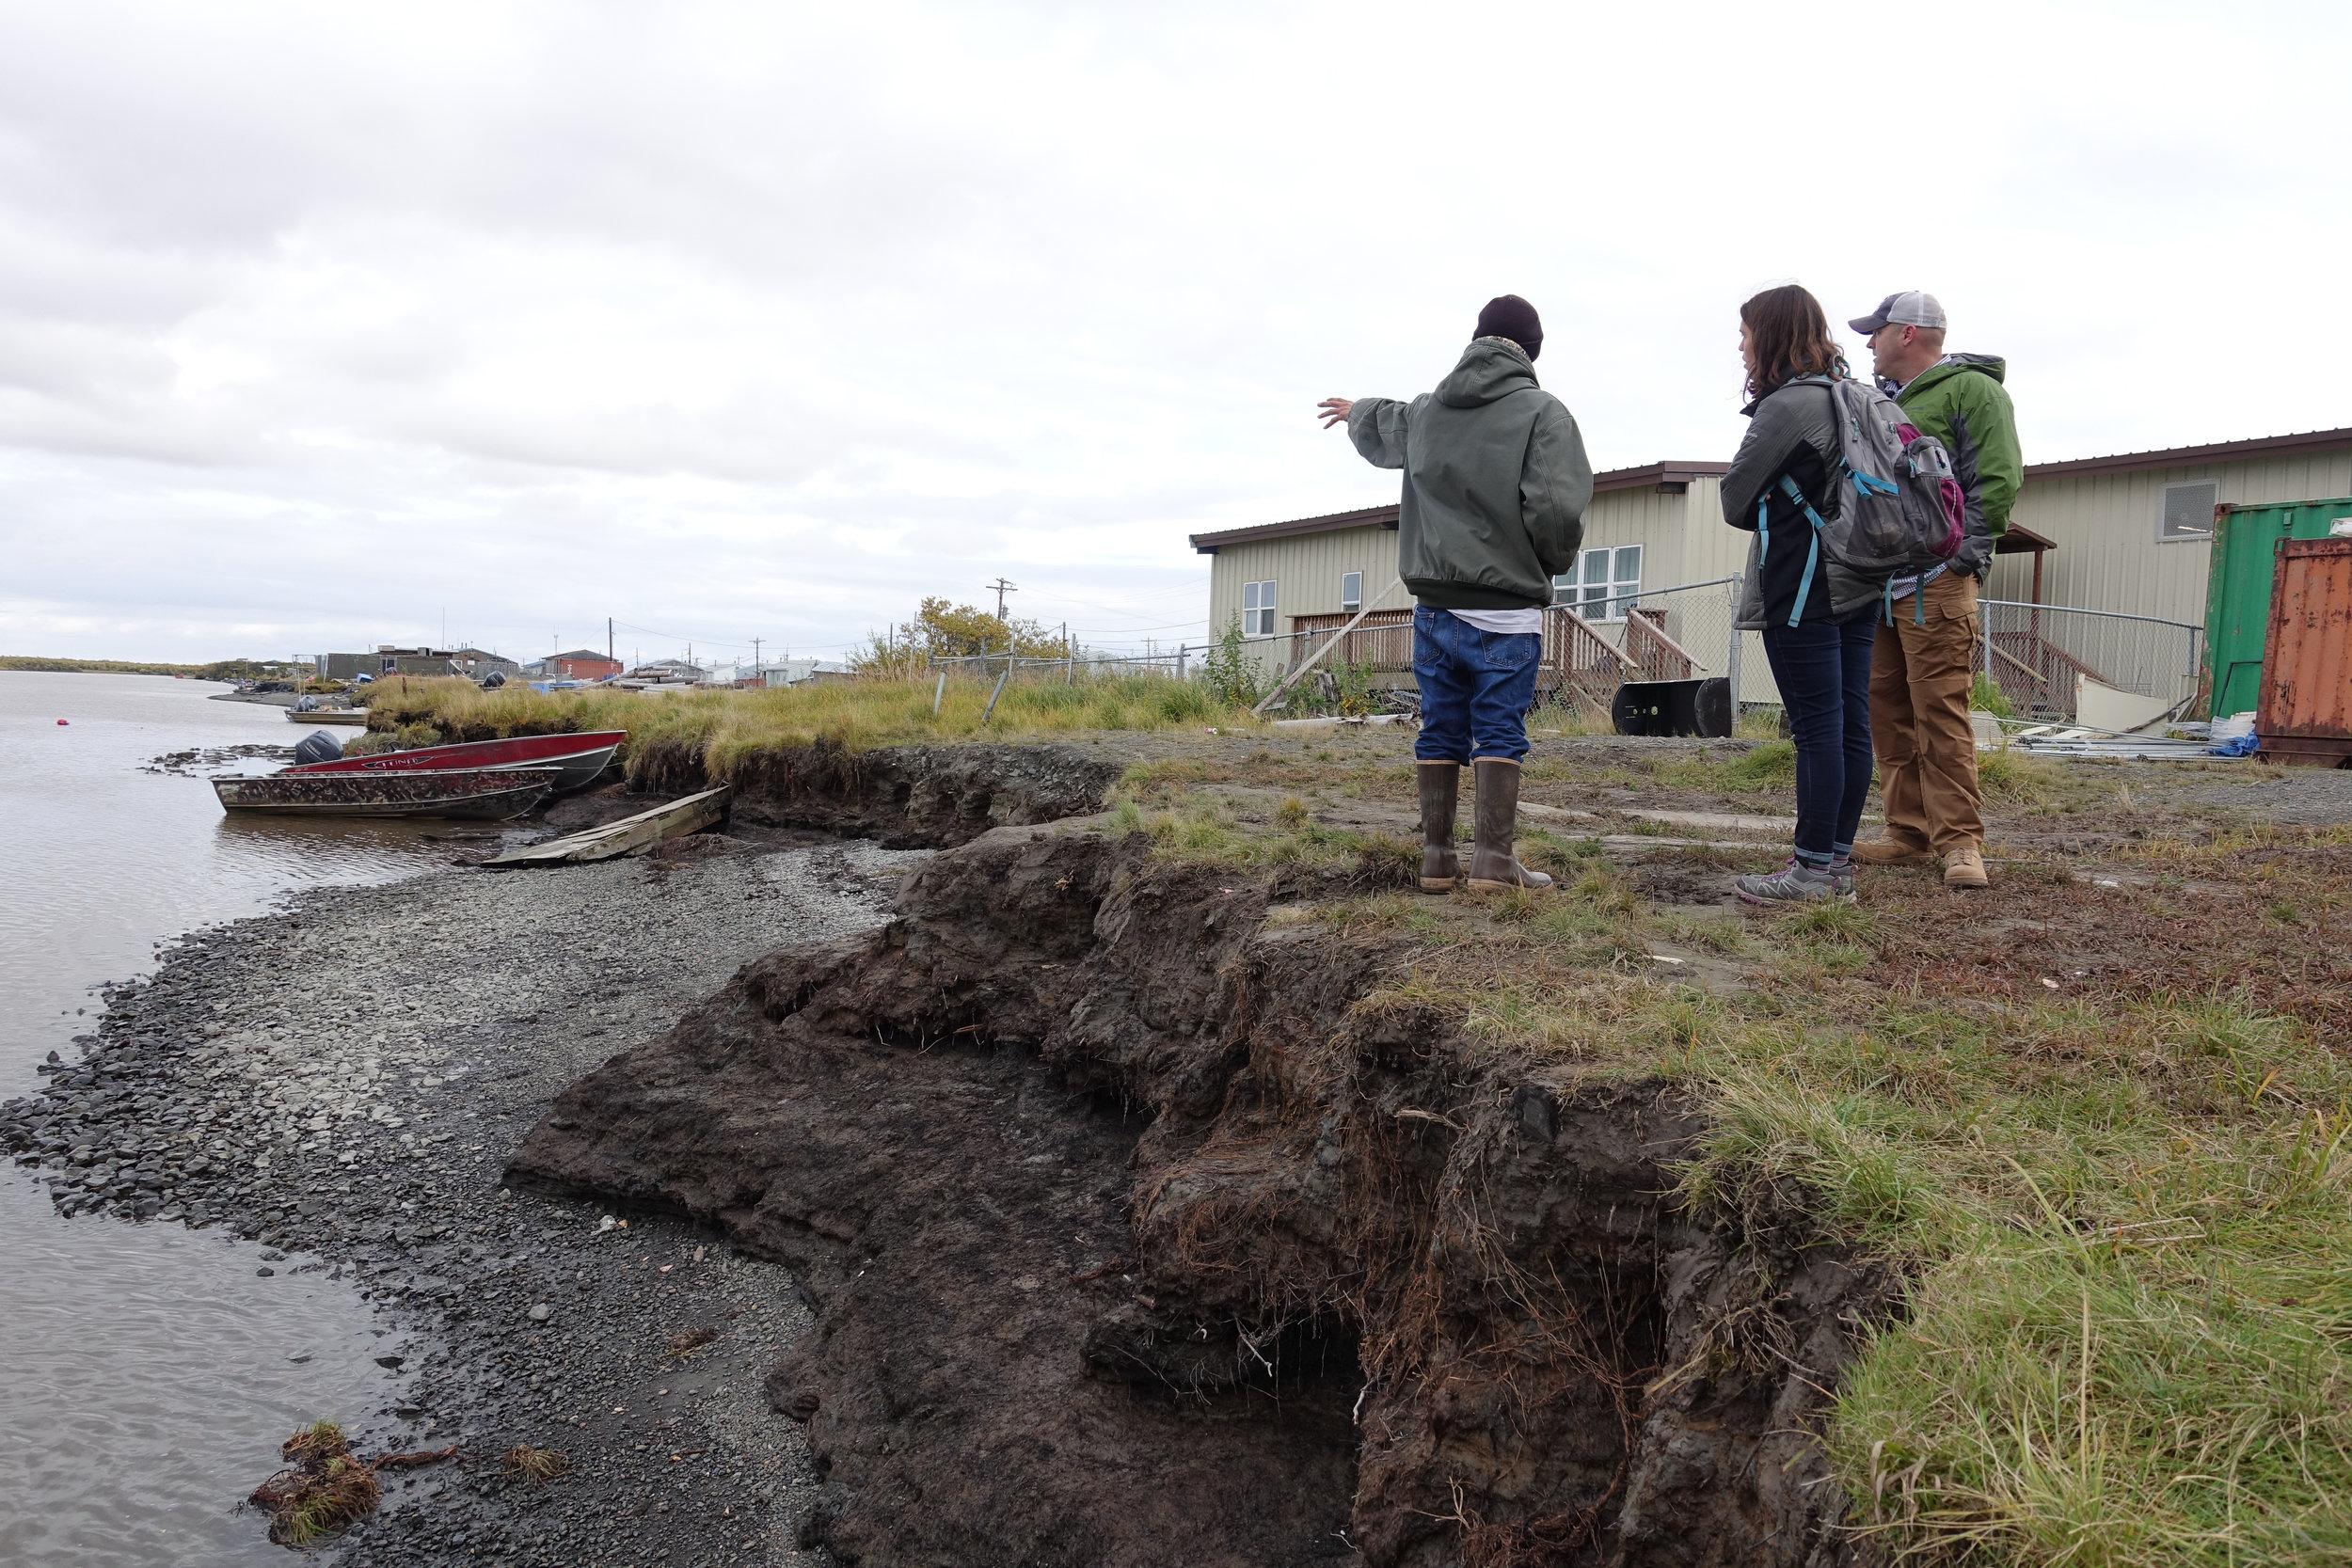 Kotlik Natives in Alaska survey usteq damage on the riverfront (Photo: ANTHC)